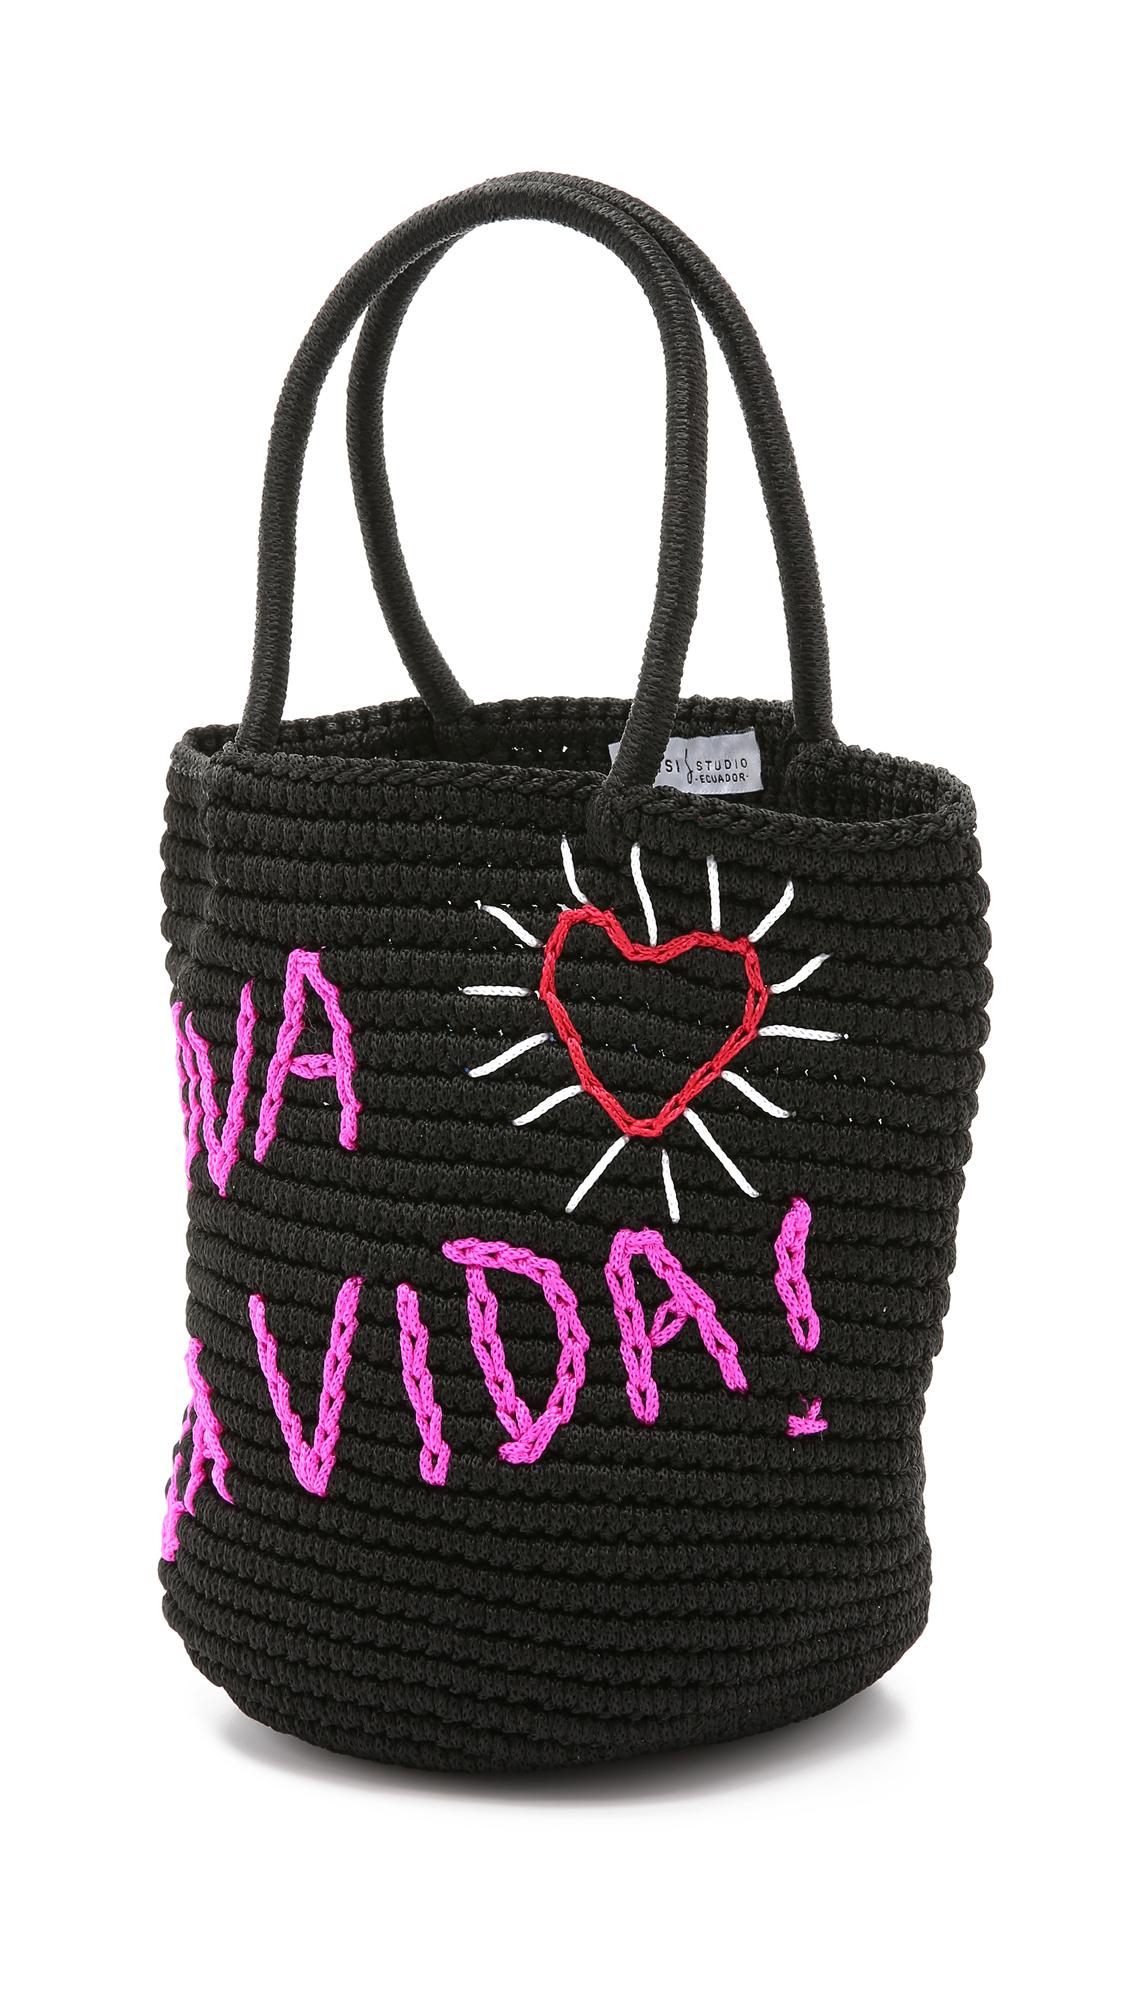 VIDA Tote Bag - Overlapping by VIDA qAe49Ogp8j